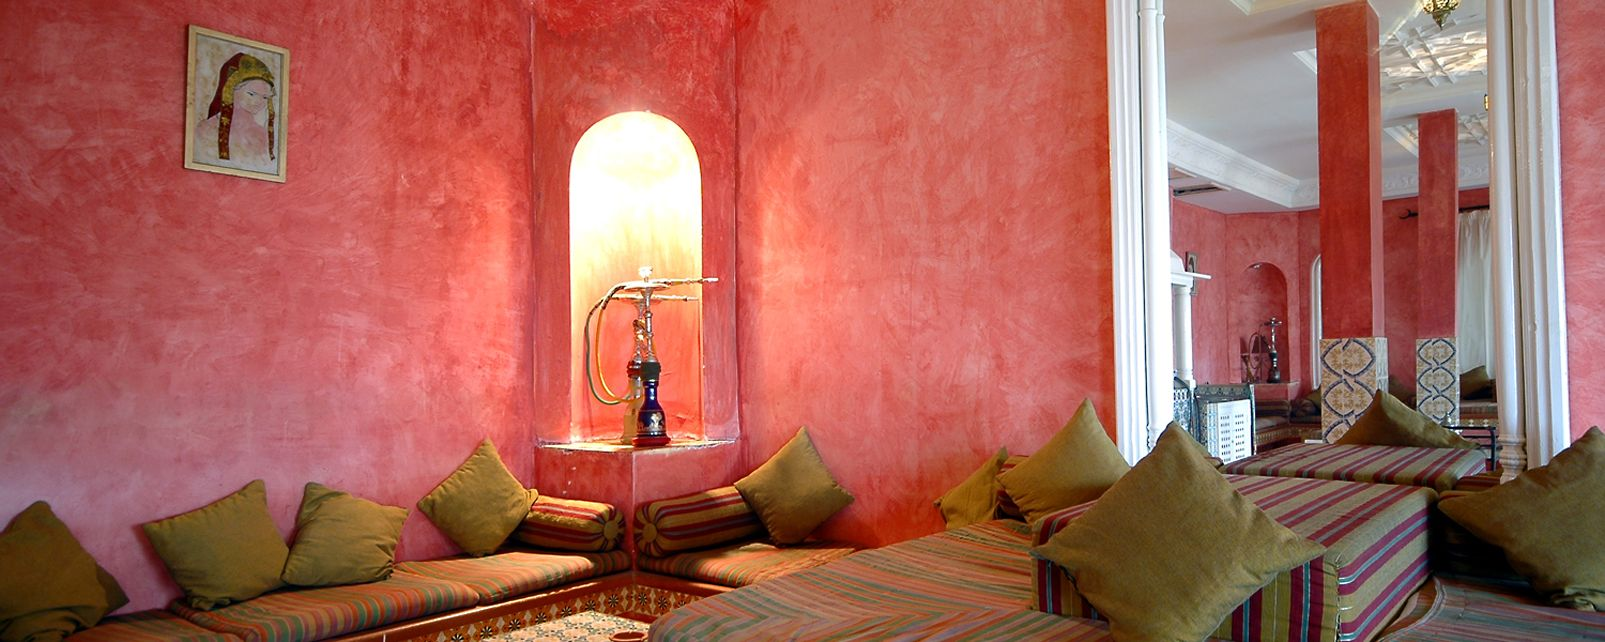 Hotel Royal Miramar